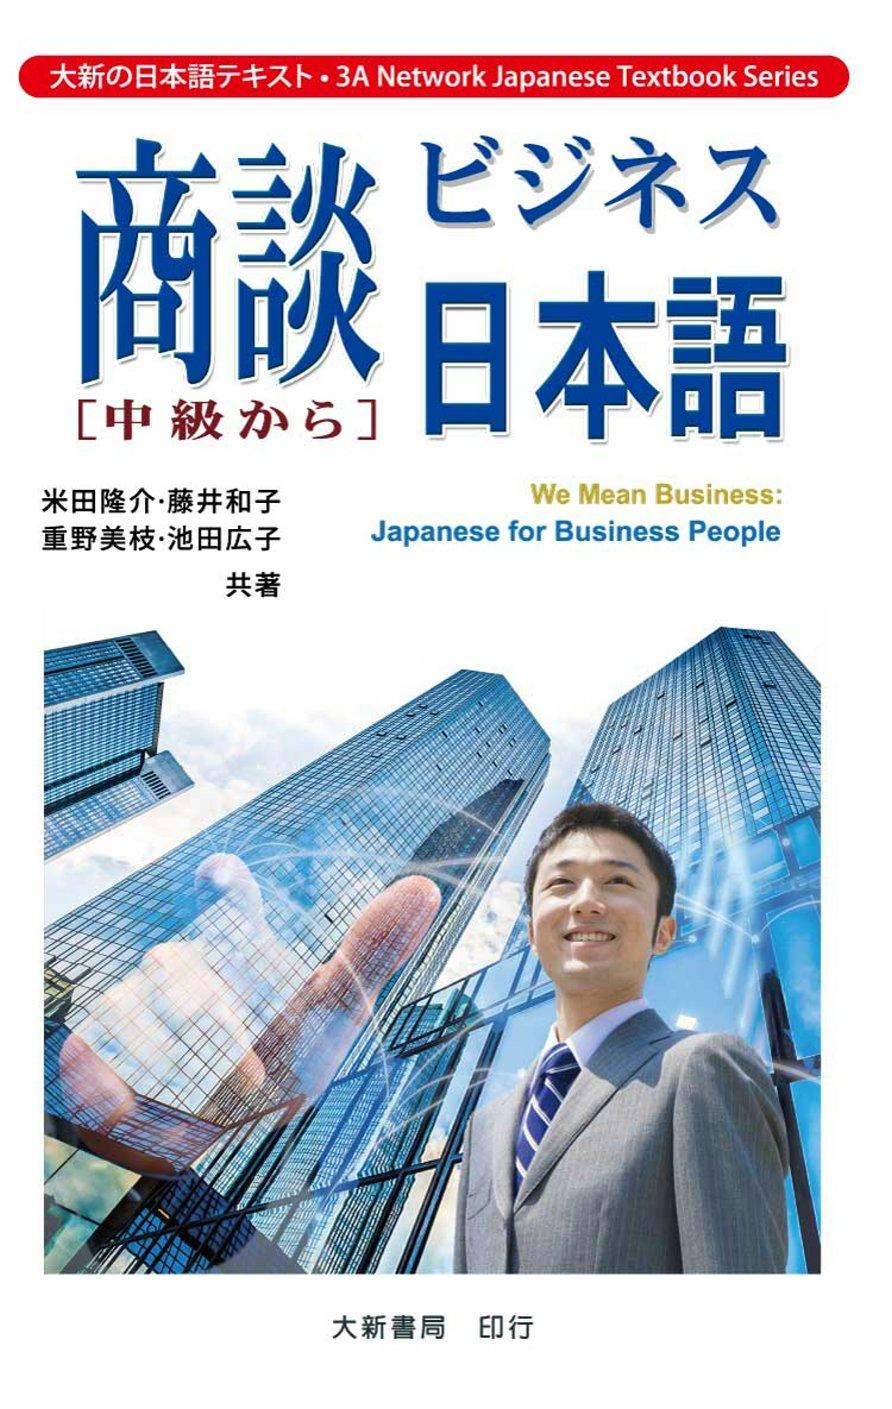 商談日本語,中級